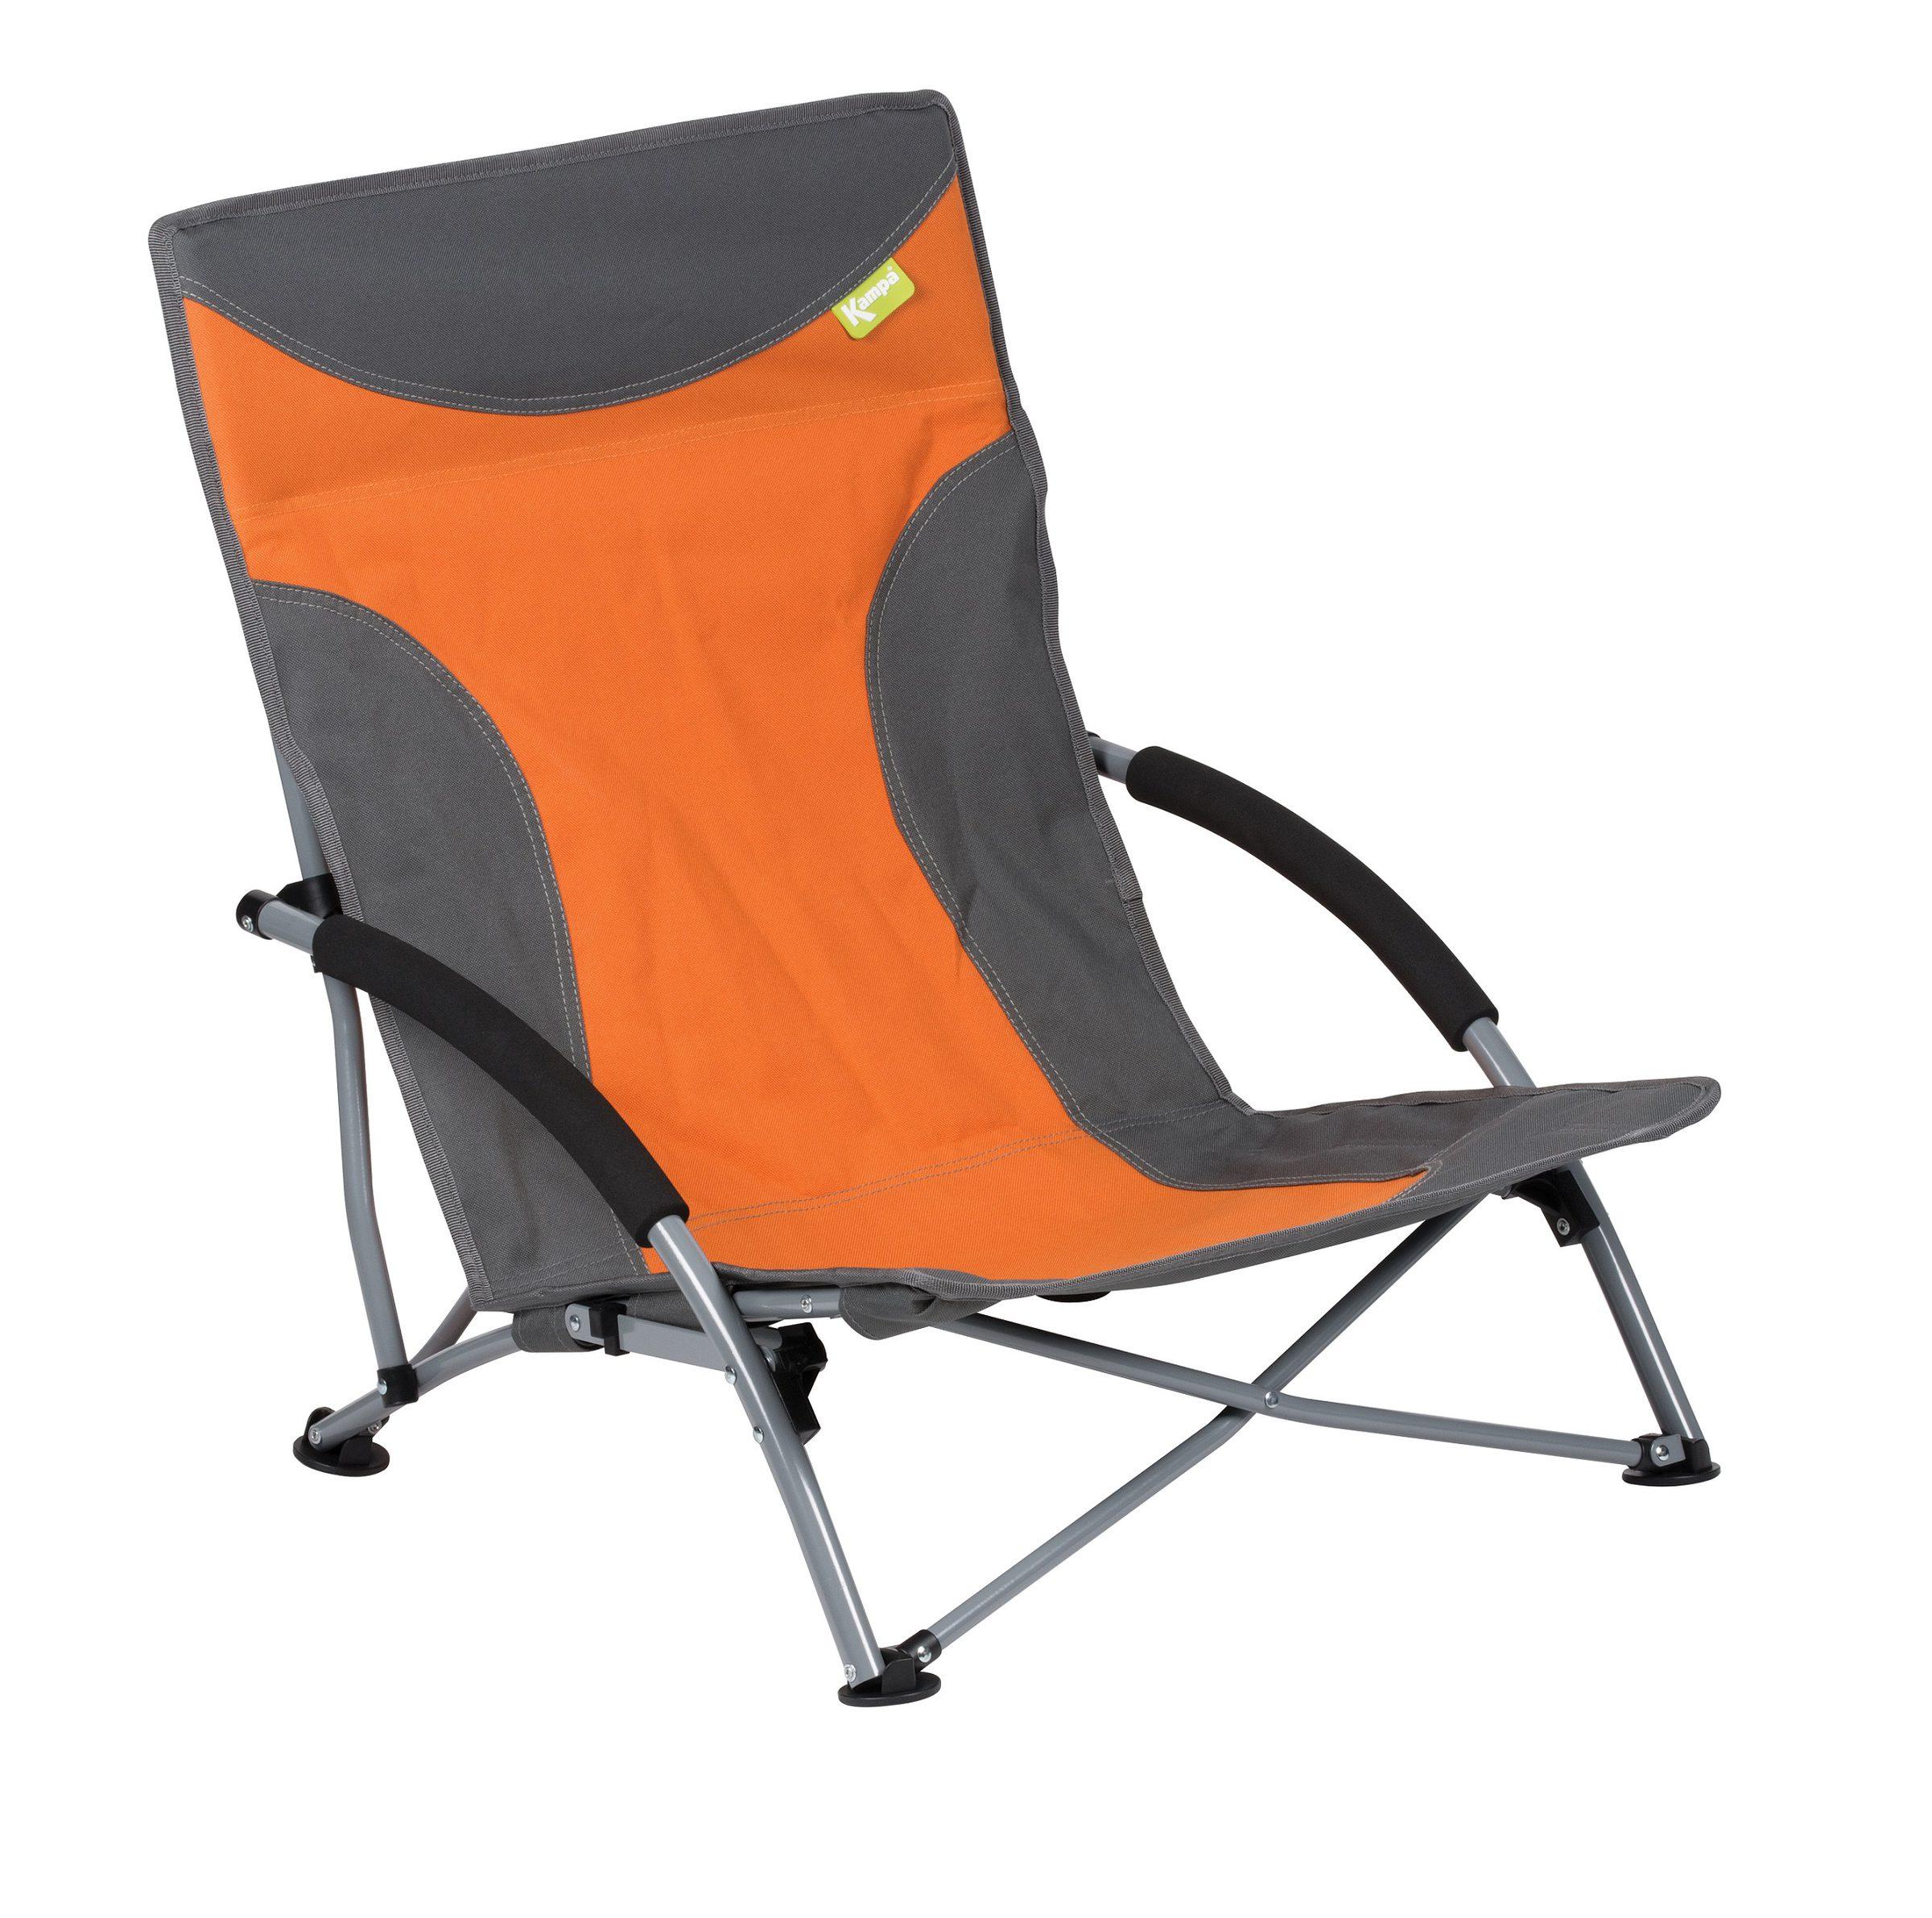 Kampa Sandy High Back Low Chair Burnt Orange - FT0047